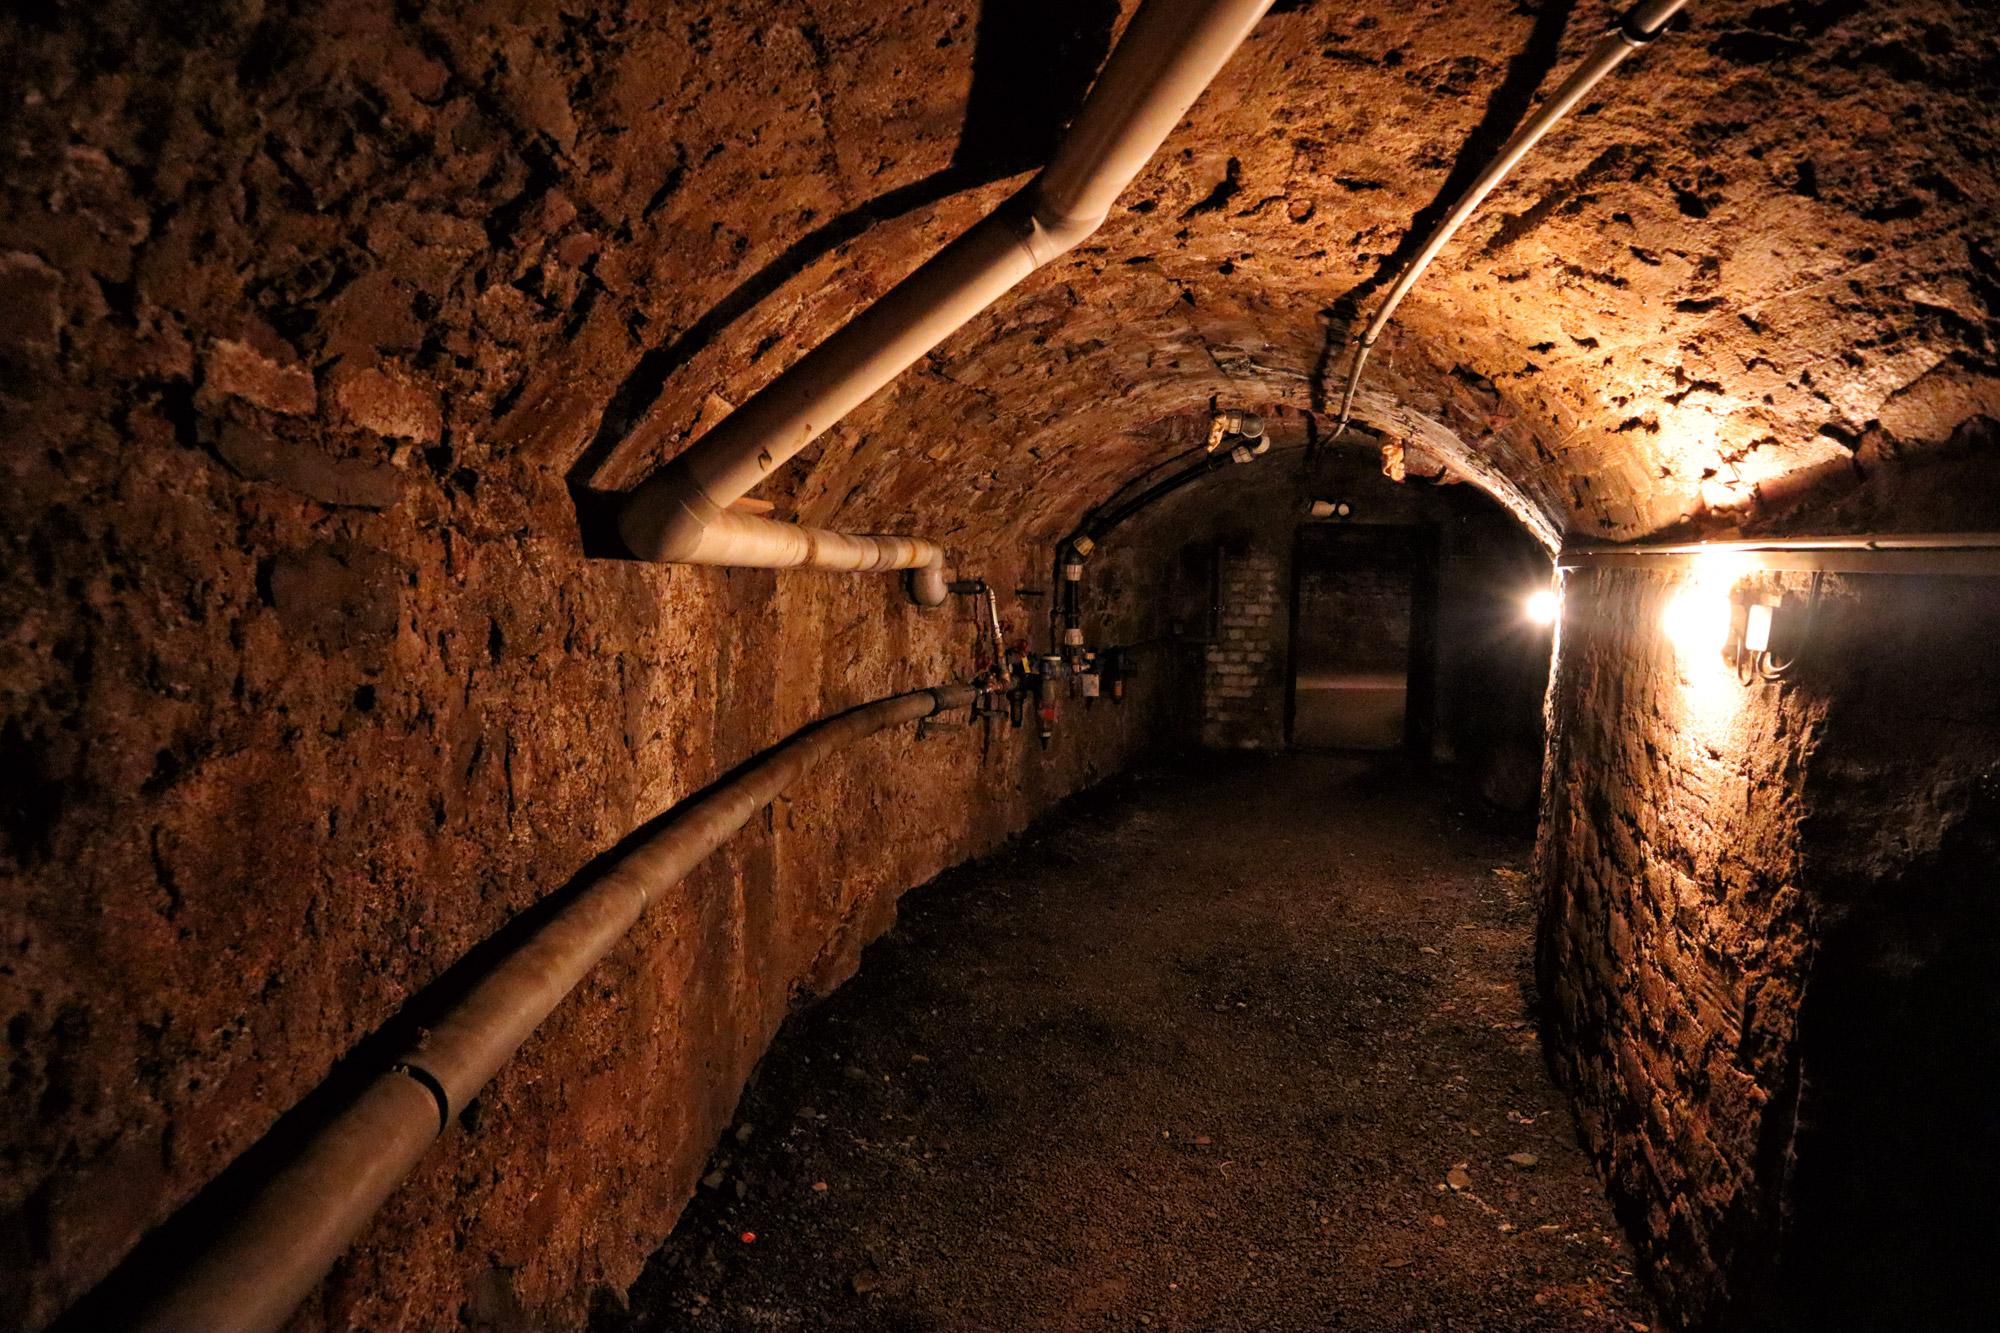 Bautzen - Ondergrondse gangen